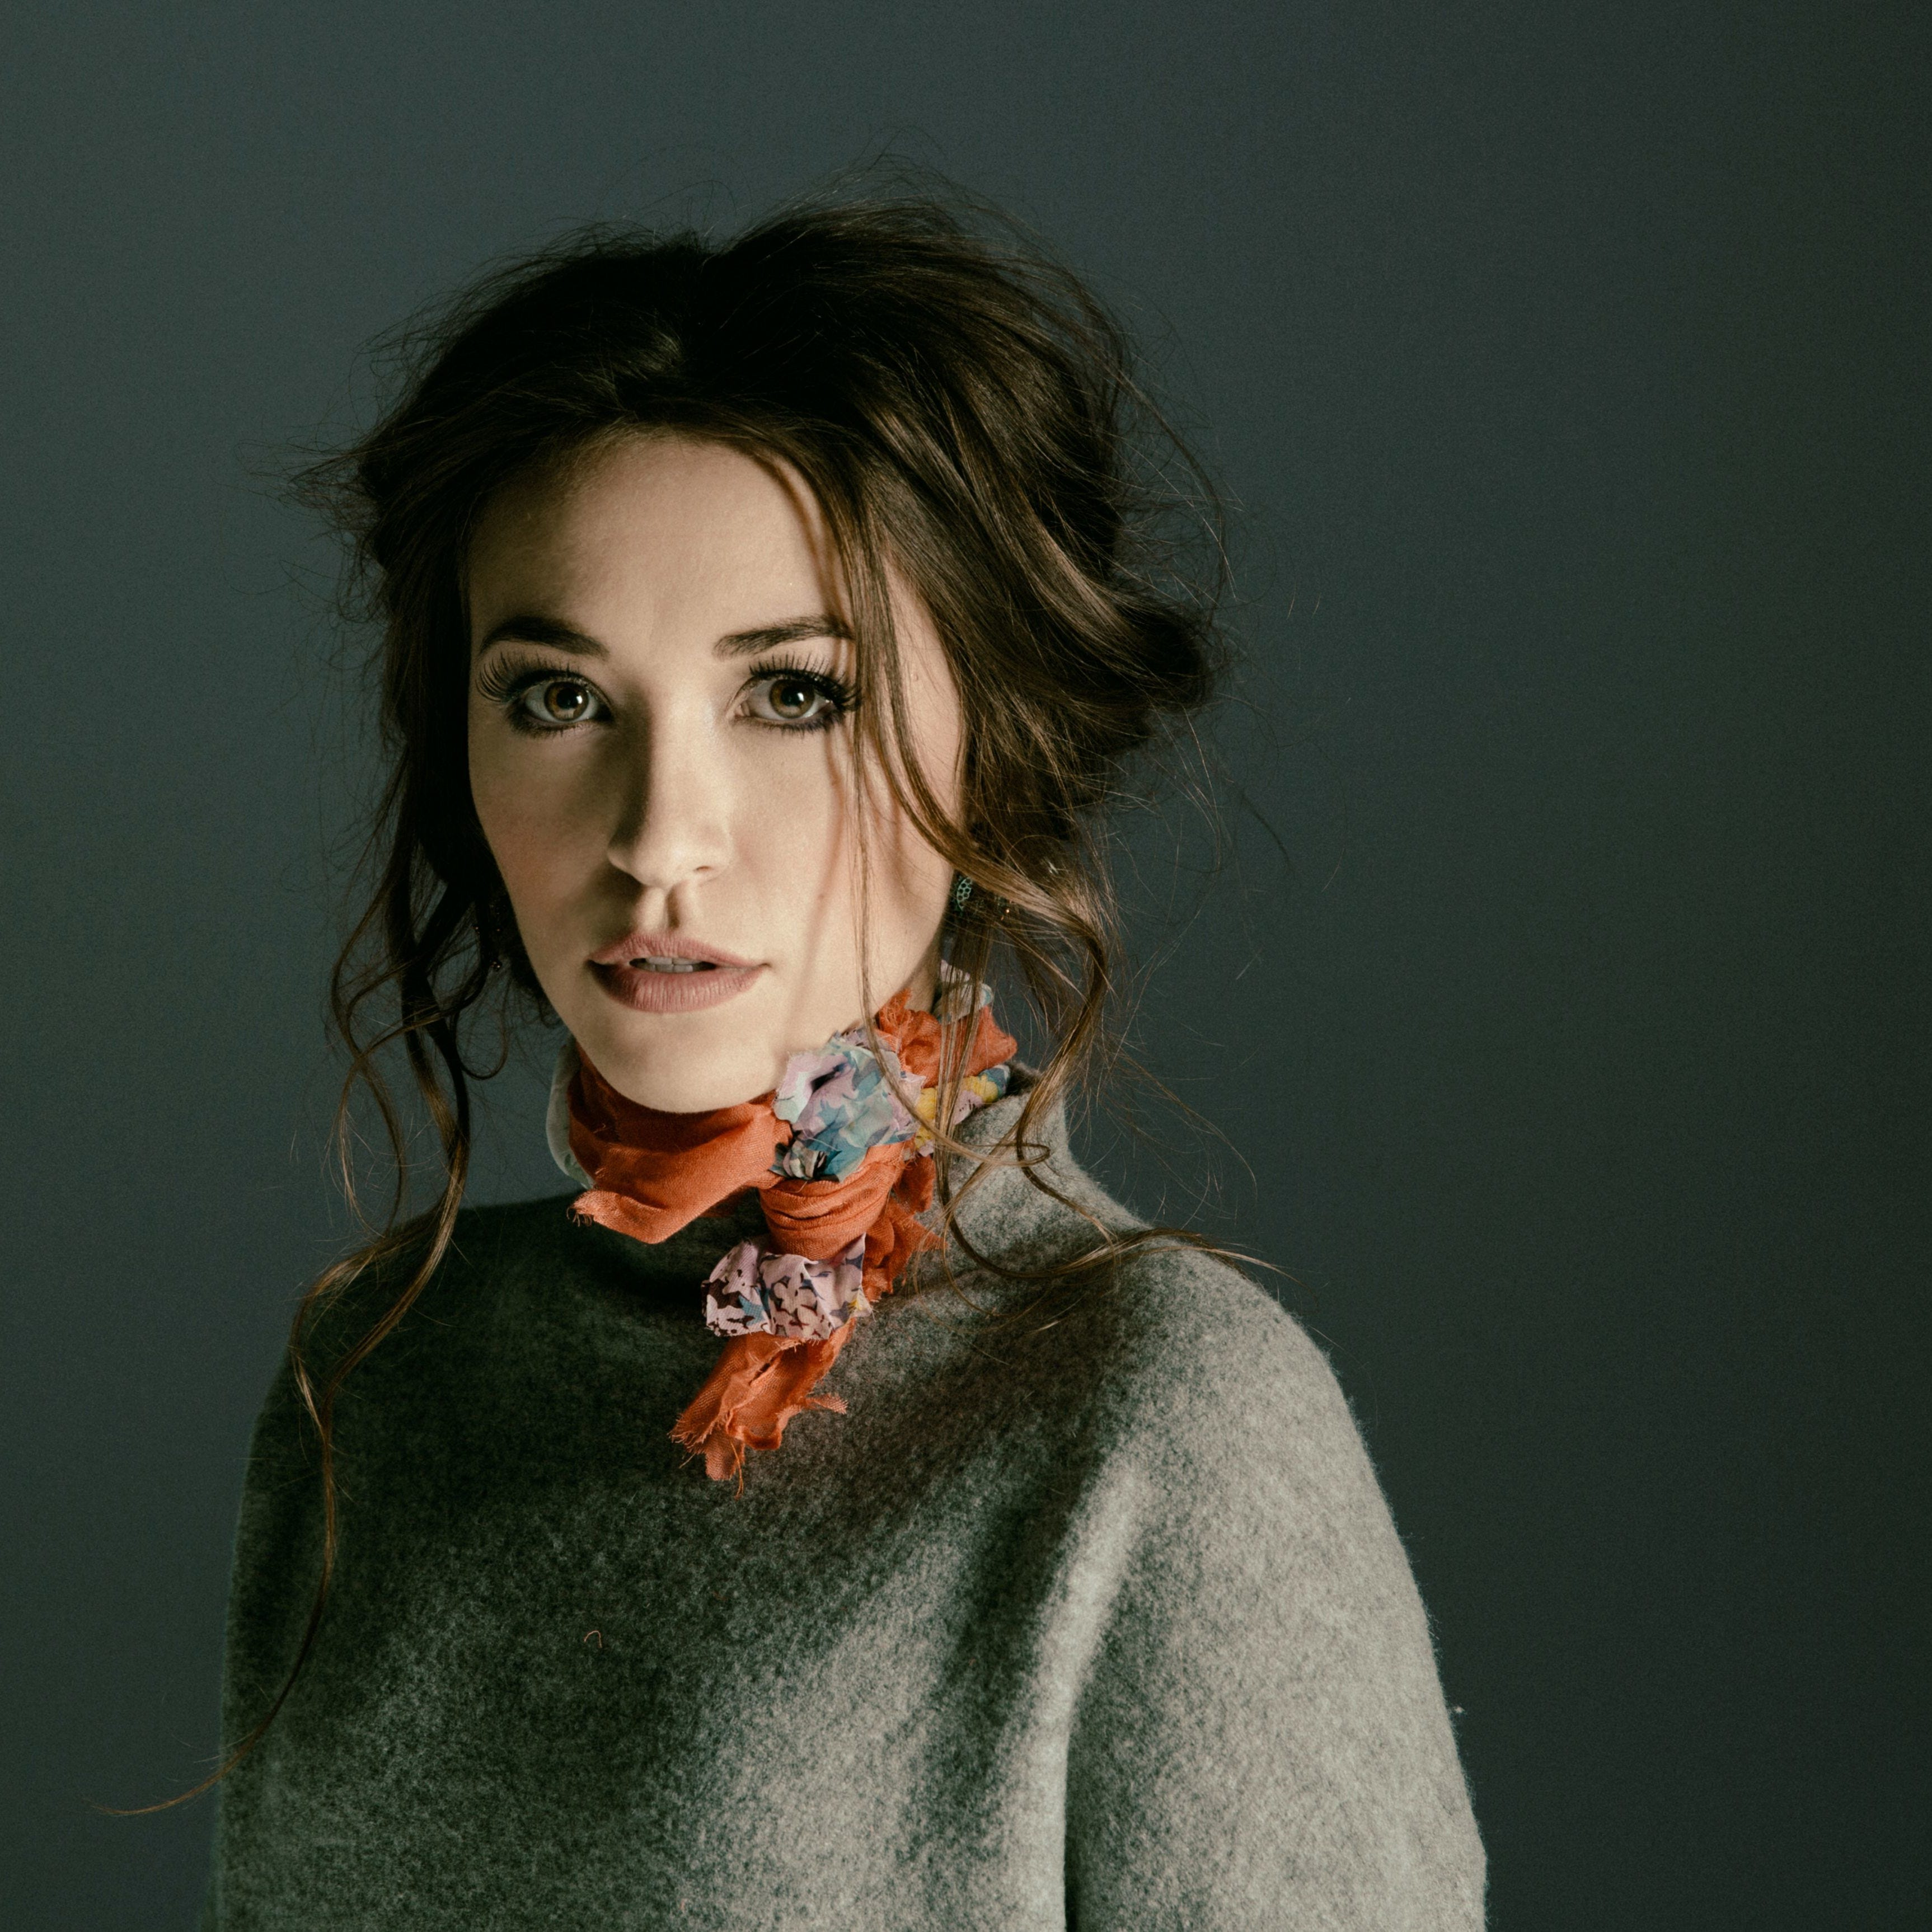 Lauren Daigle wins Grammy for song and album